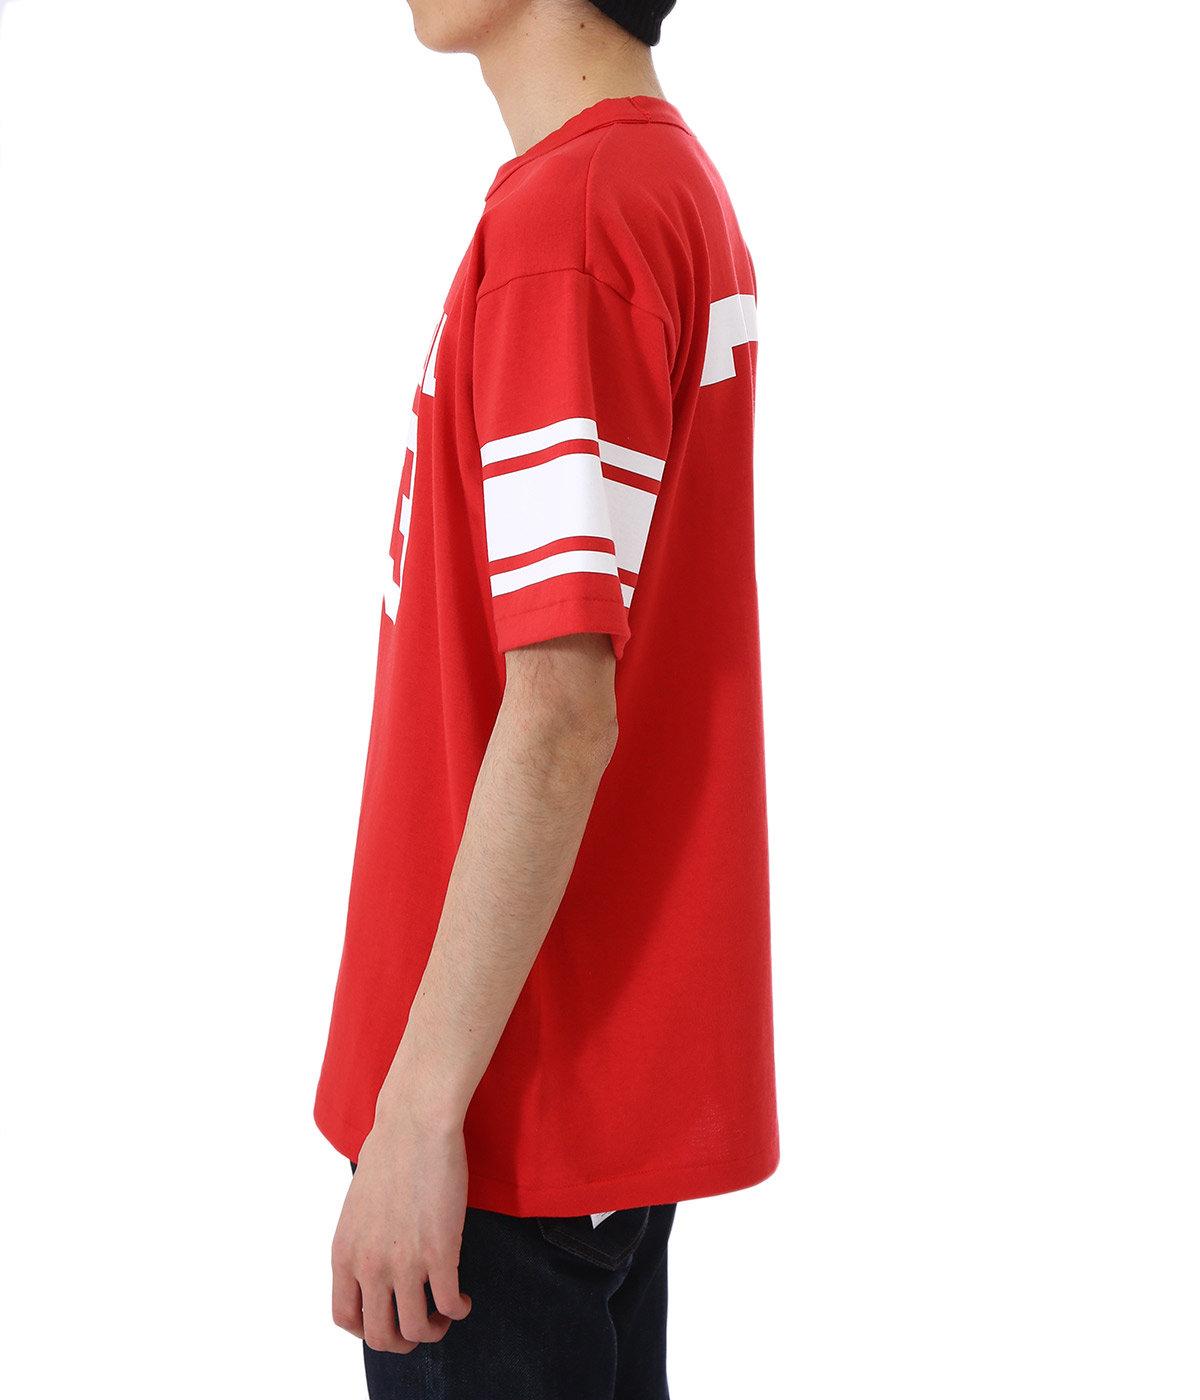 """WIN"" 1/4 SLEEVE FOOTBALL T-SHIRT"